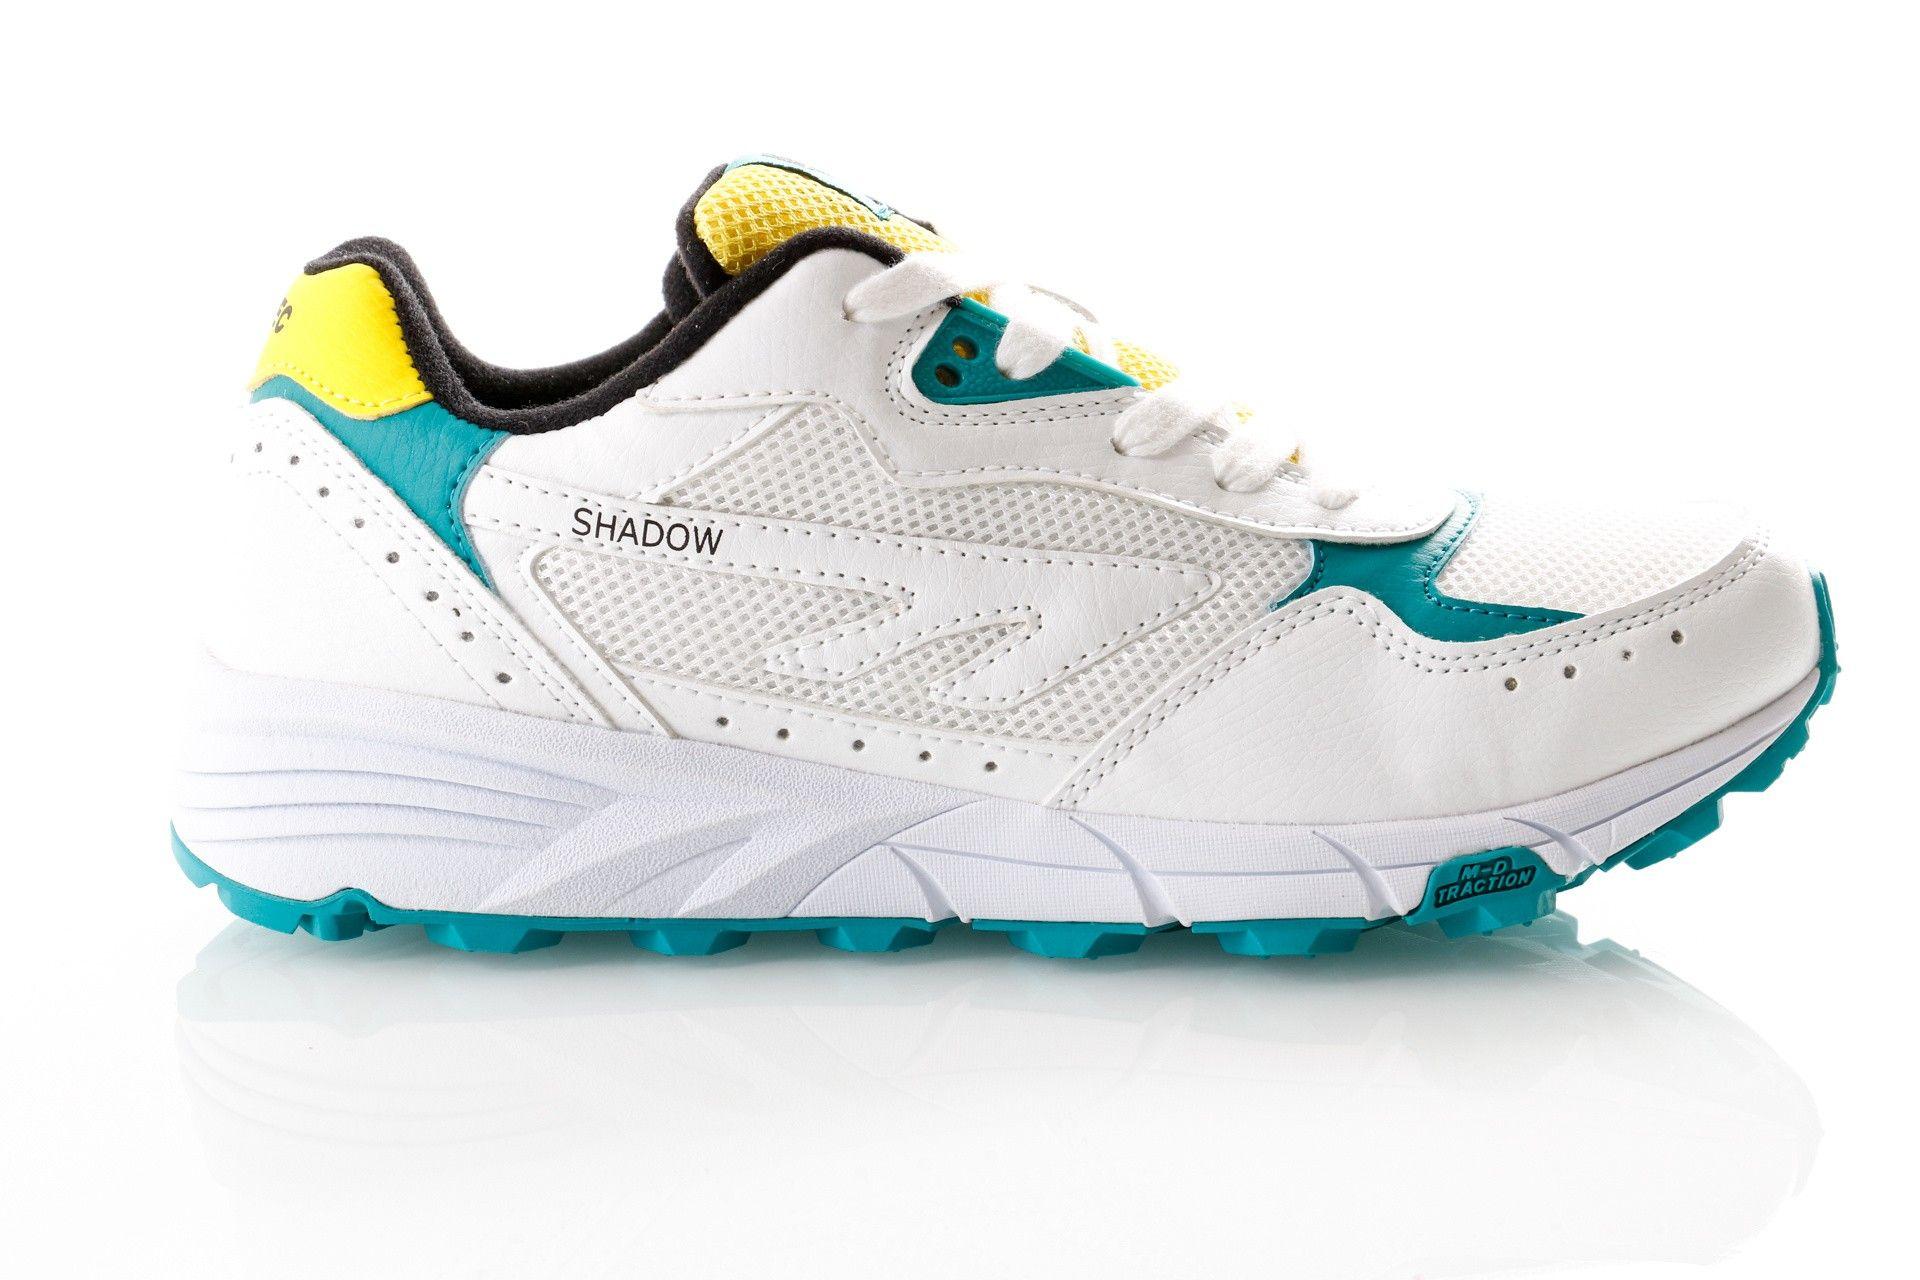 Afbeelding van Hi-Tec Shadow Tl S010009-013 Sneakers White/Navigate/Yellow